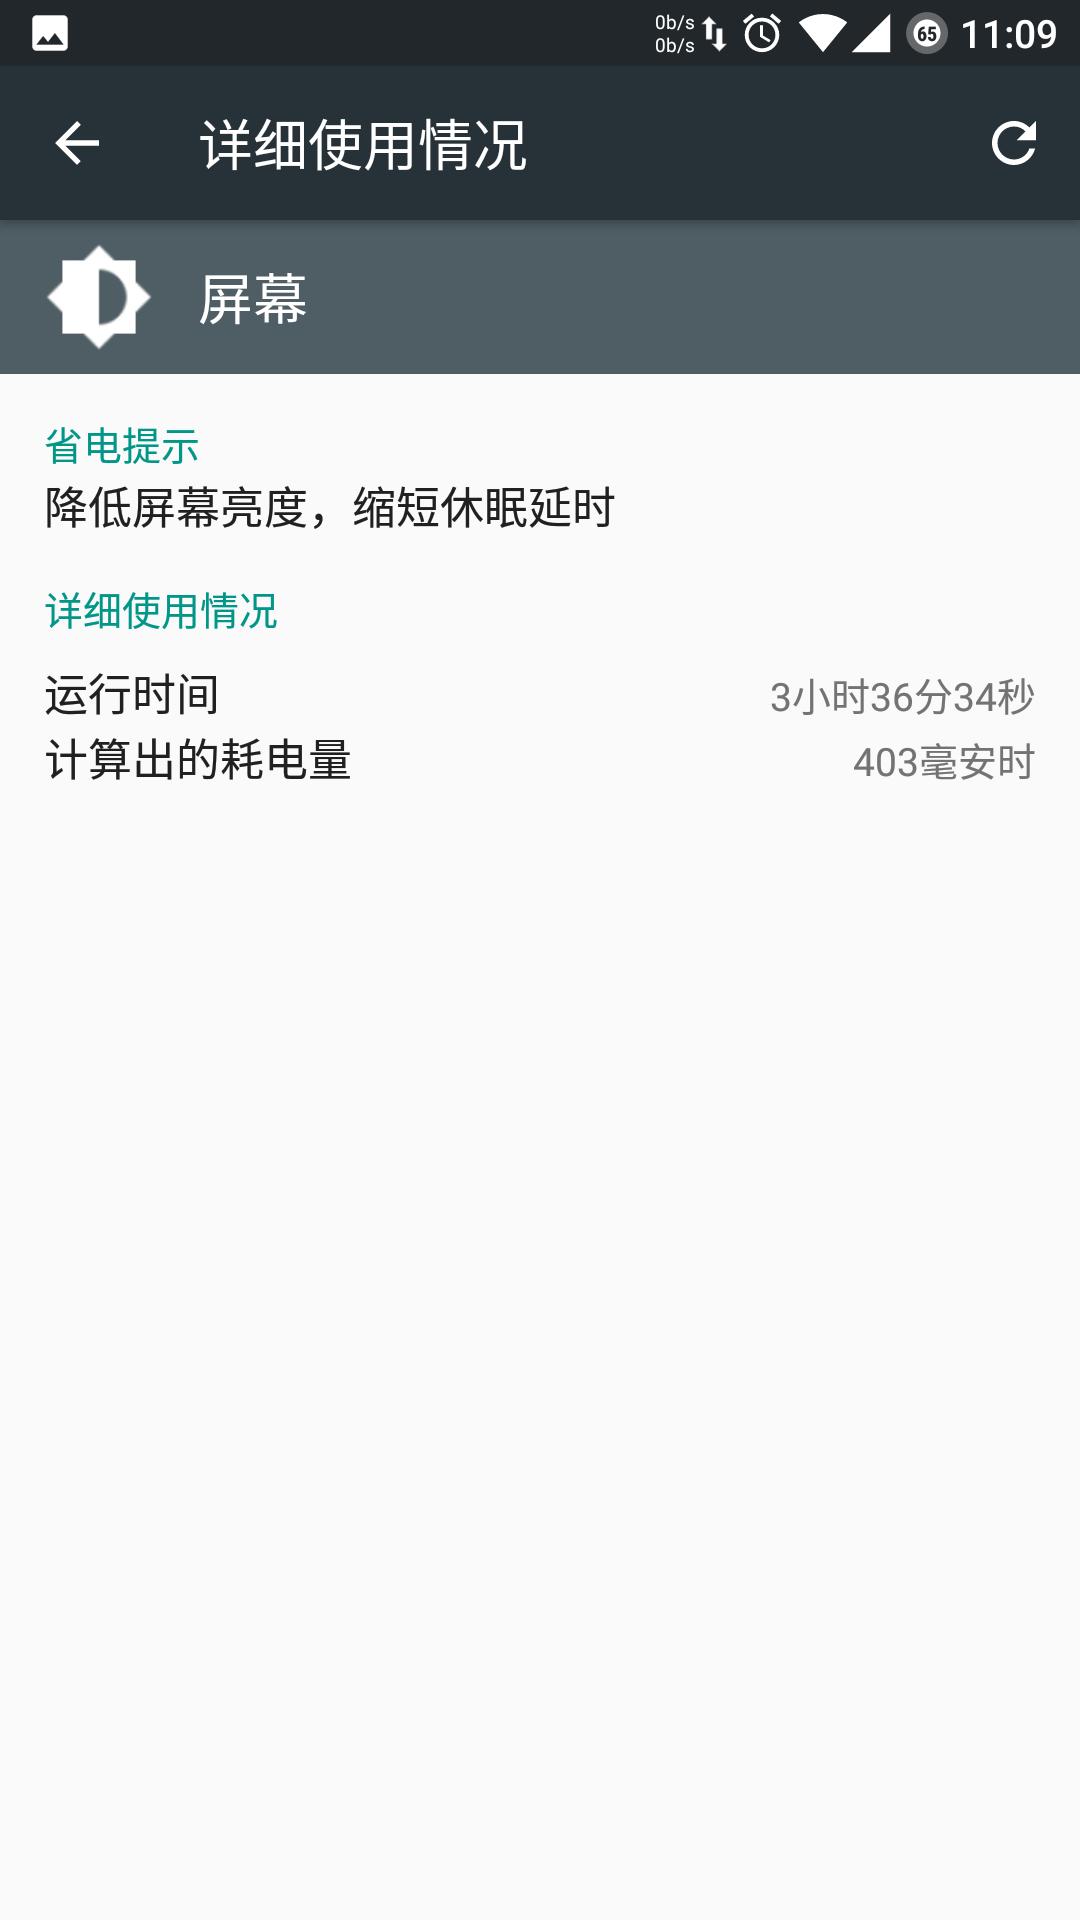 Screenshot_20160720-110908.png